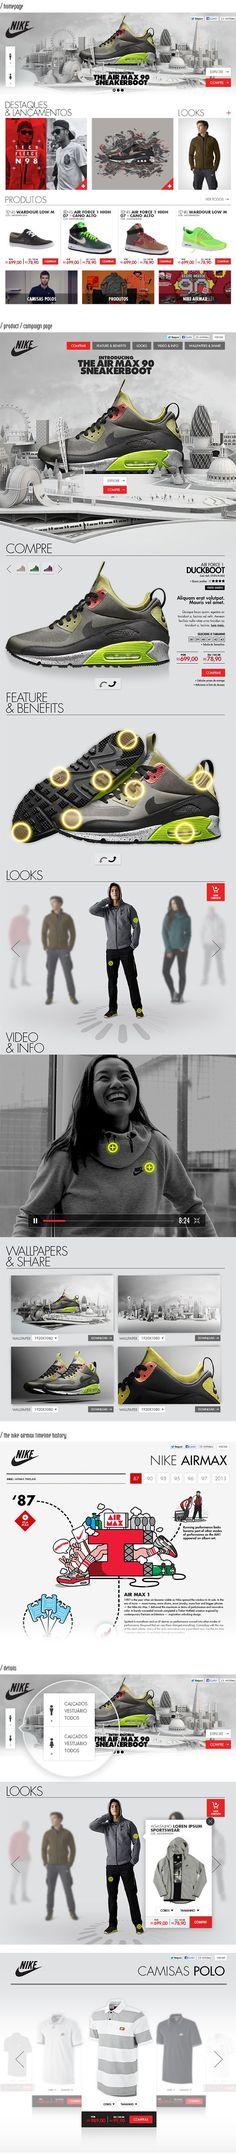 Nike Sportswear Artwalk by Fabricio Alves #inspiration #ux #ui